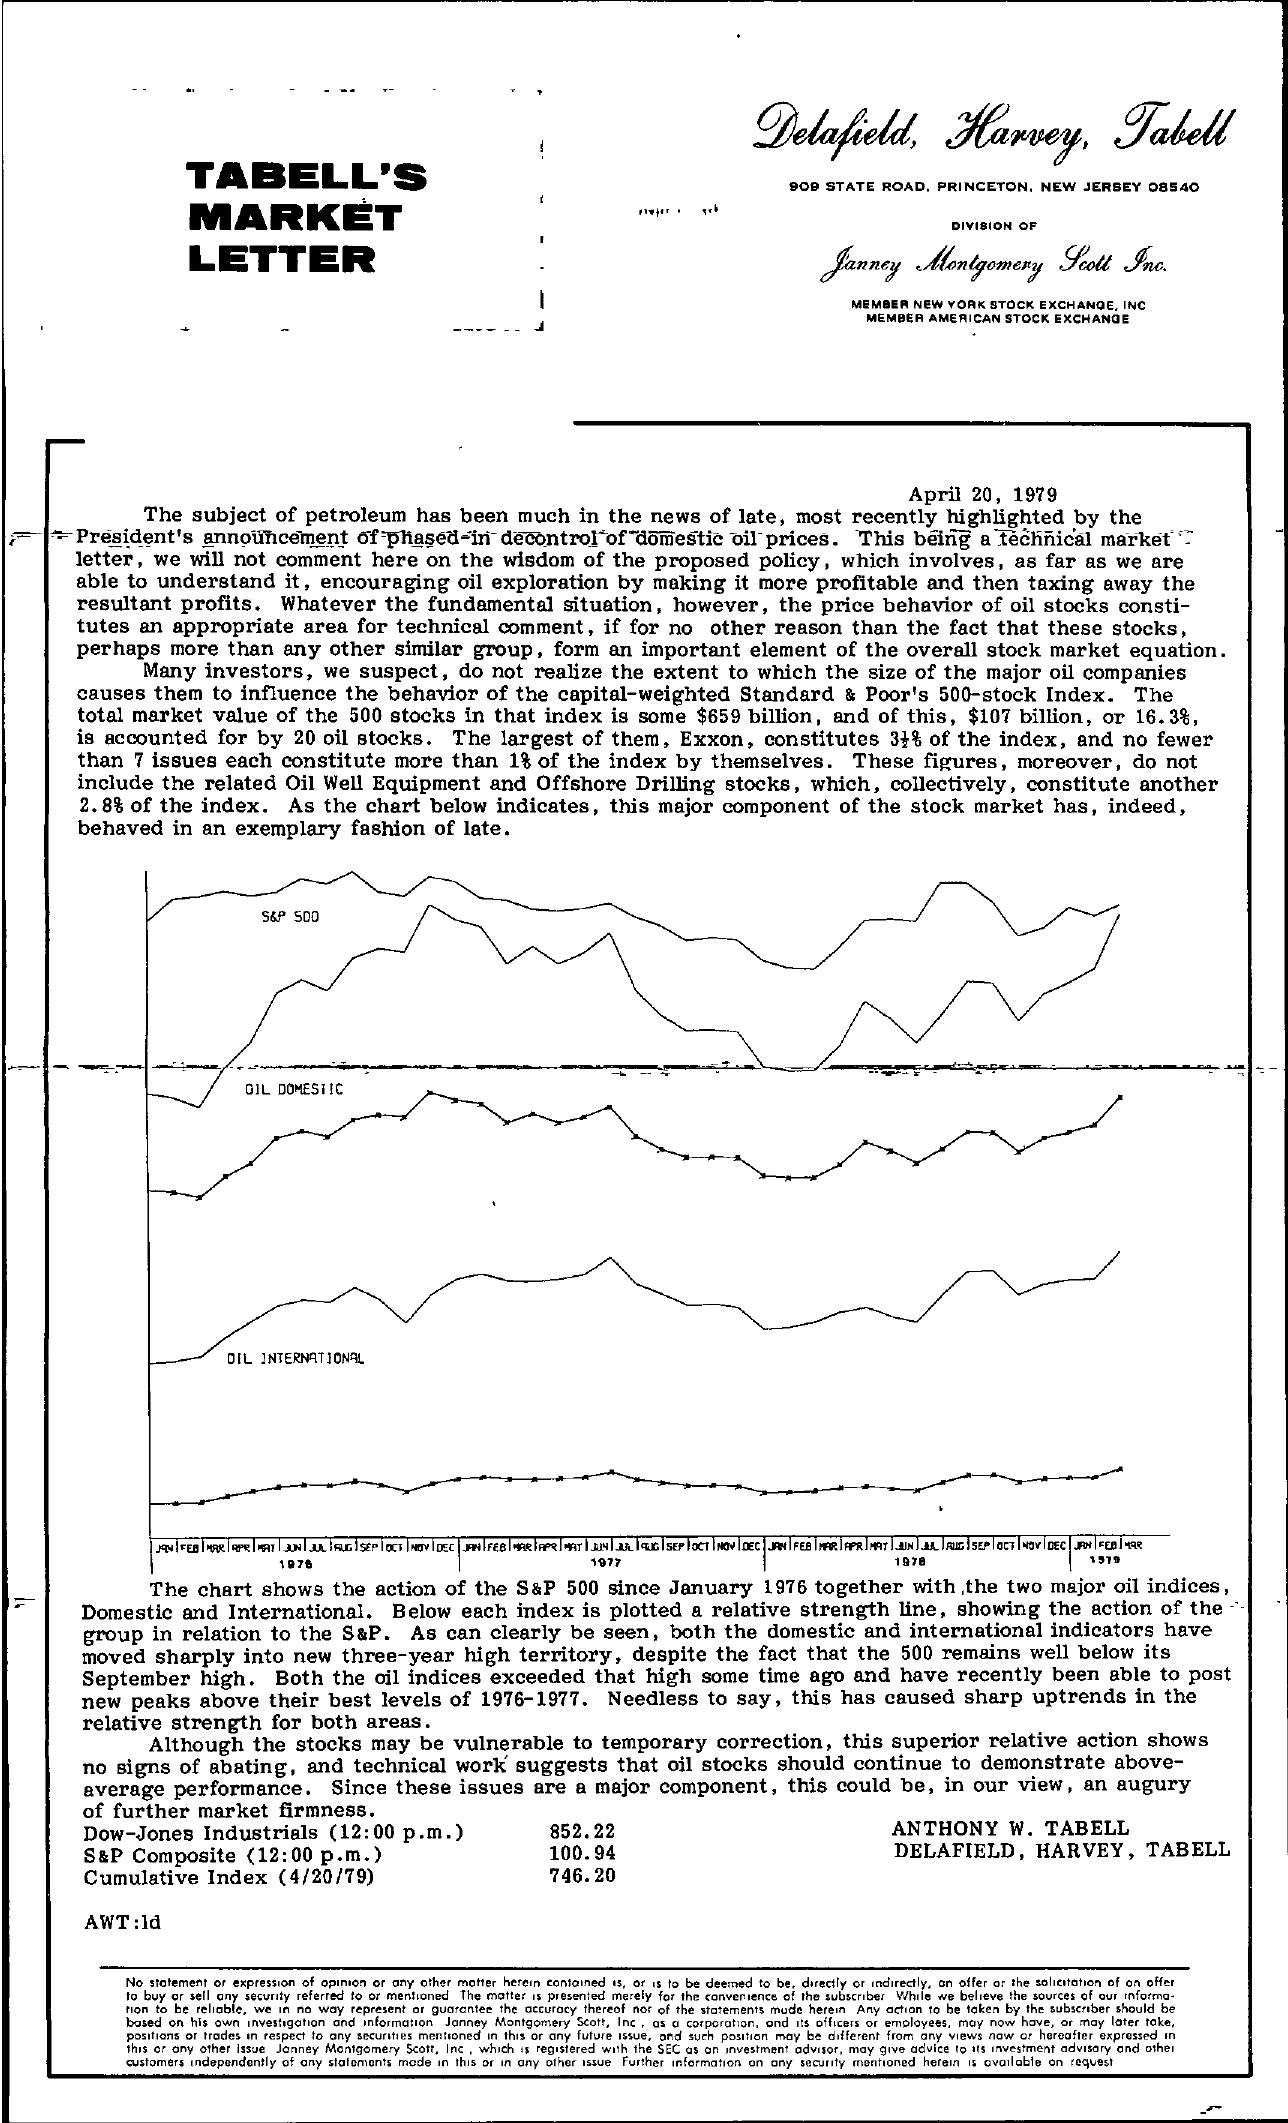 Tabell's Market Letter - April 20, 1979